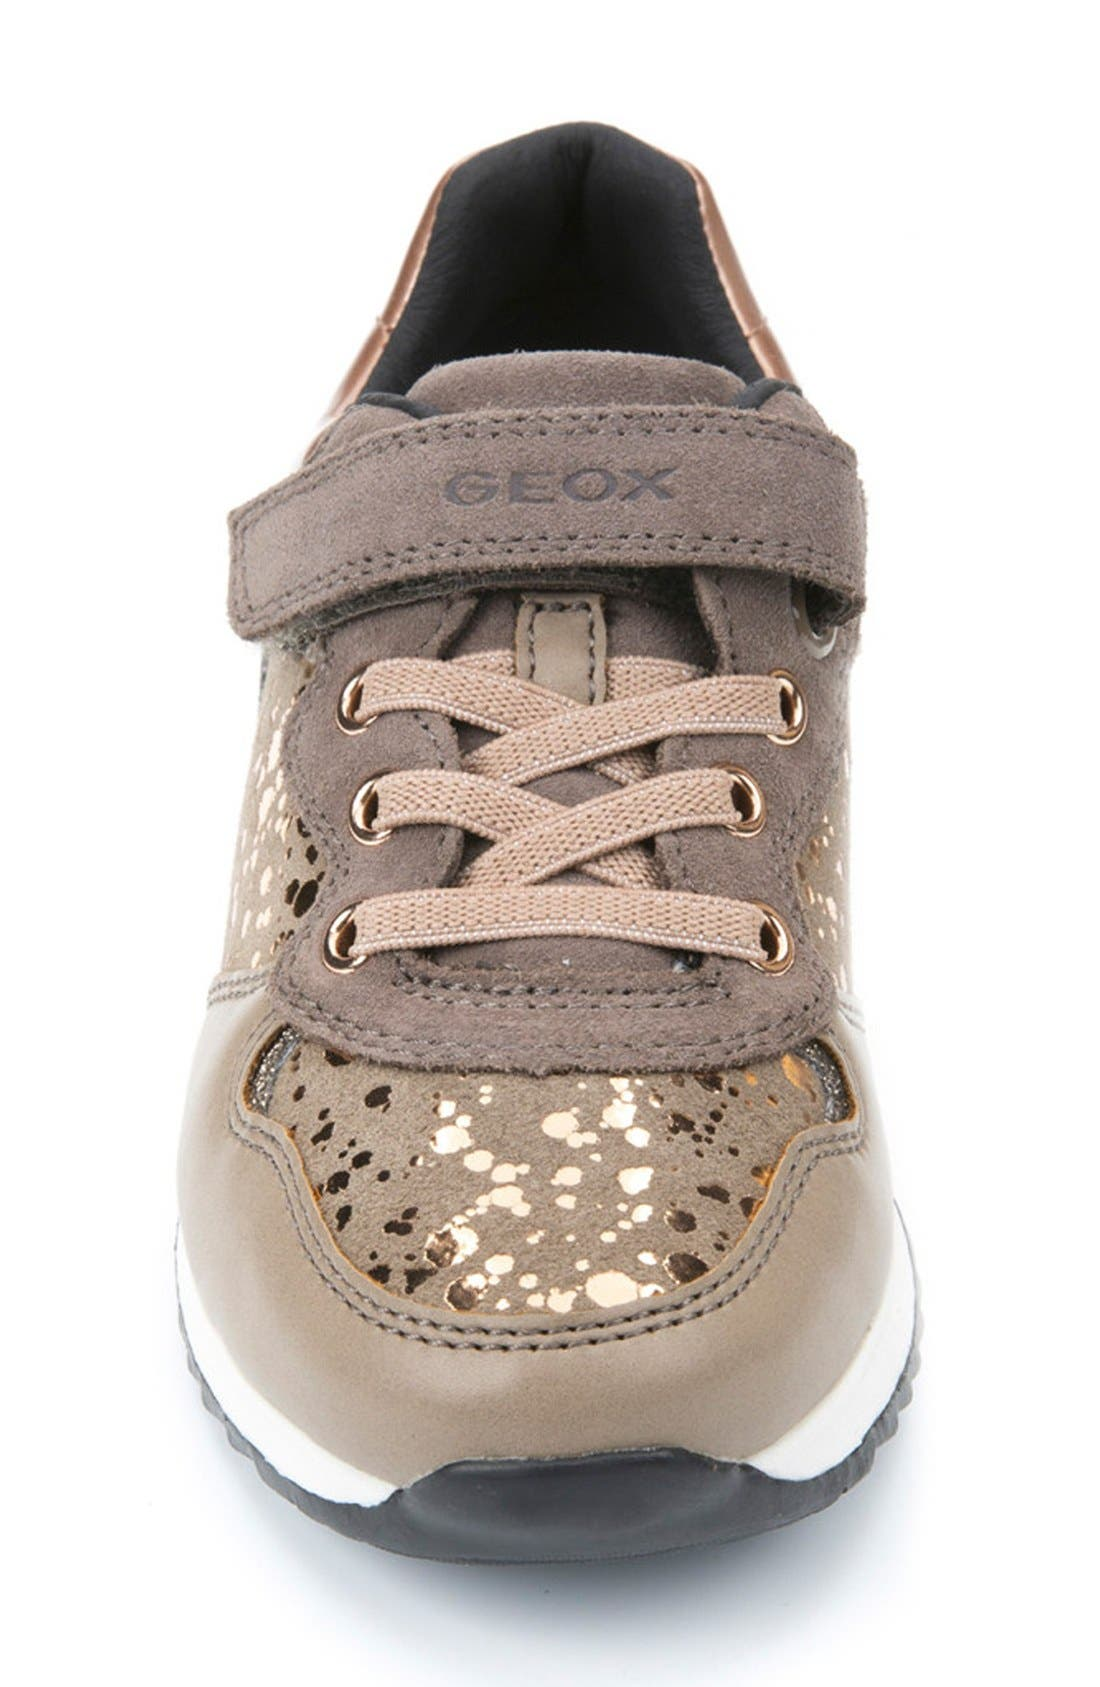 Maisie Sneaker,                             Alternate thumbnail 4, color,                             Dark Beige